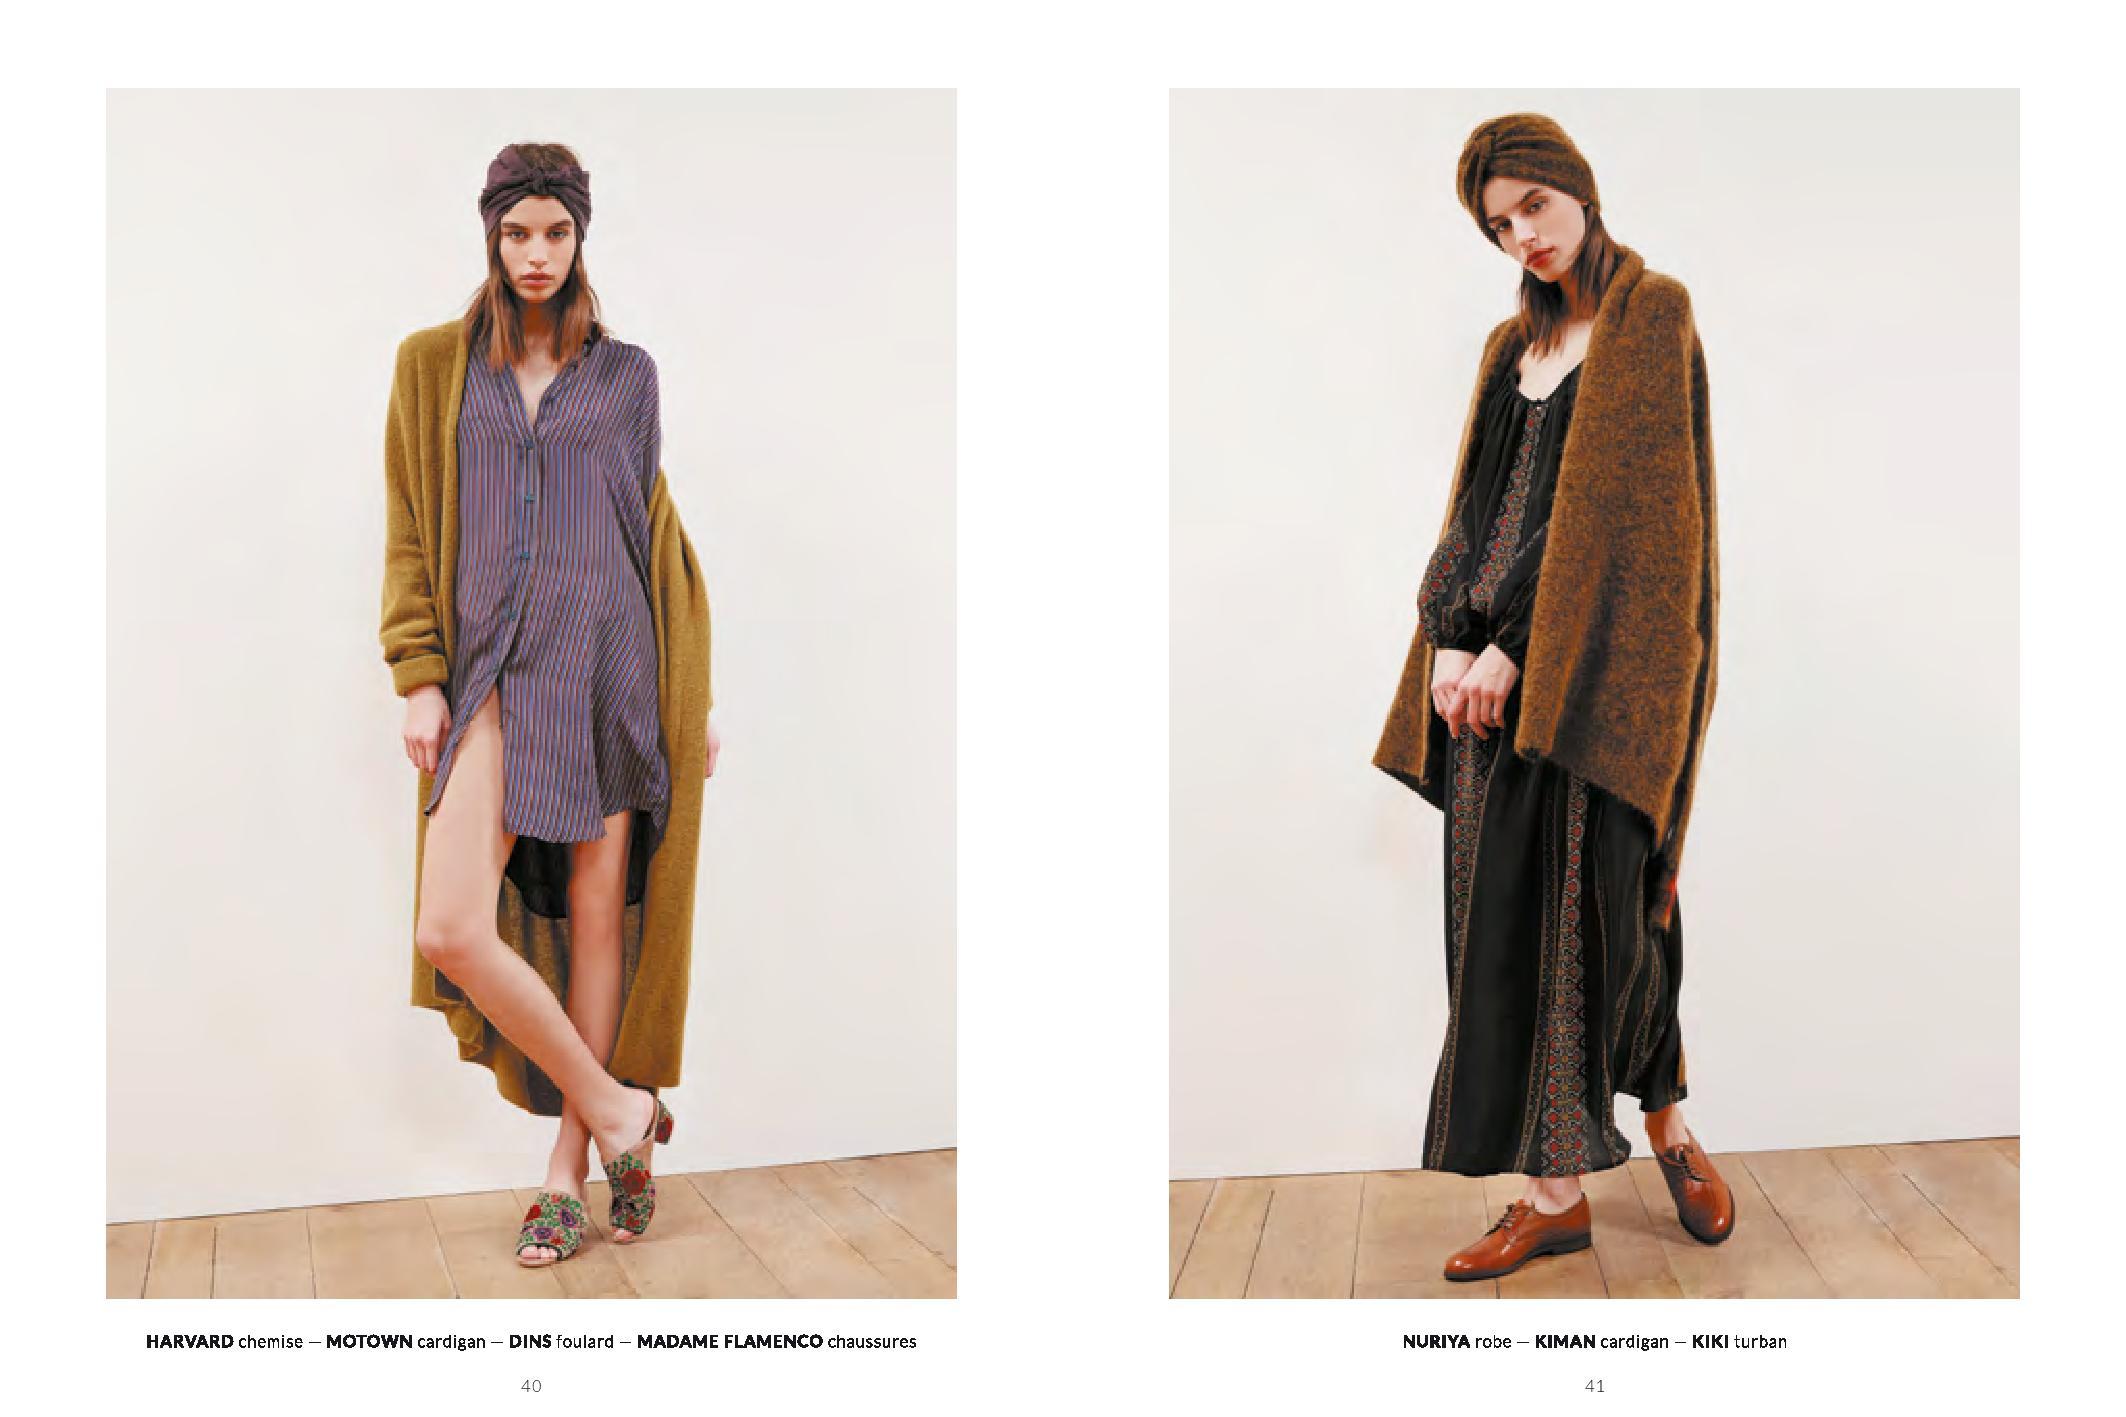 a2_md_lookbook_mes_demoiselles_paris_web_dresscode-page-023.jpg